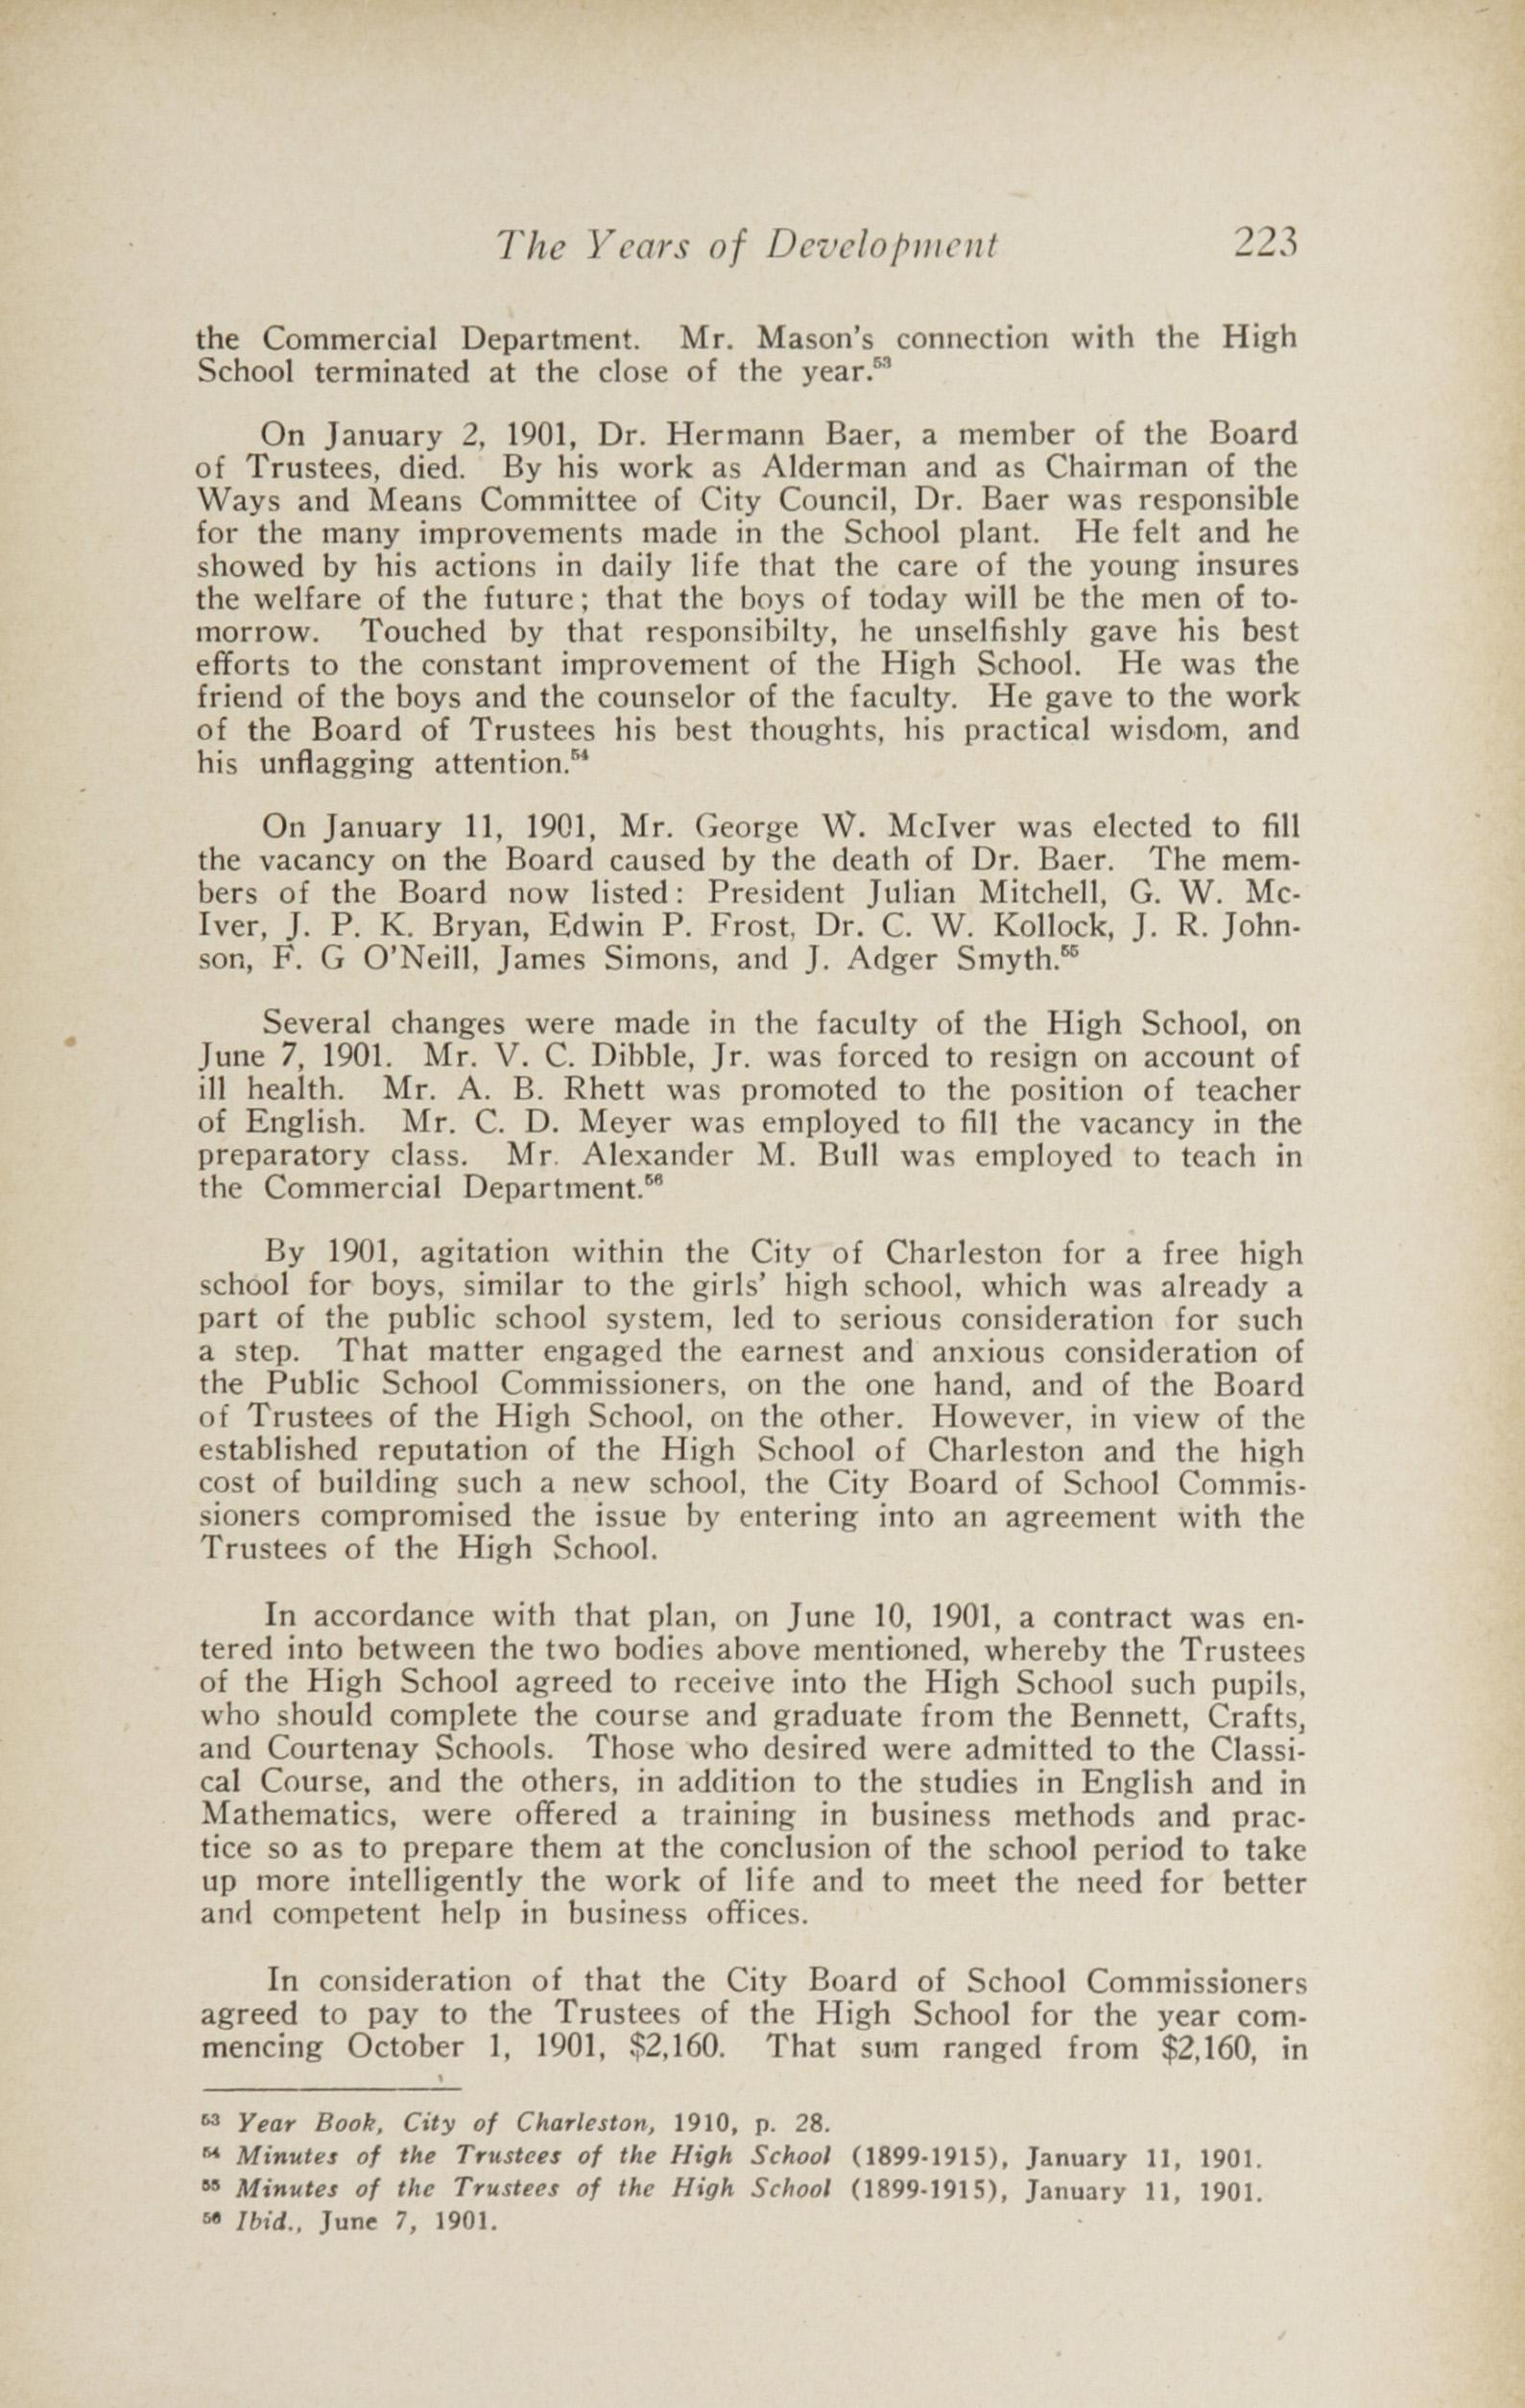 Charleston Yearbook, 1943, page 223